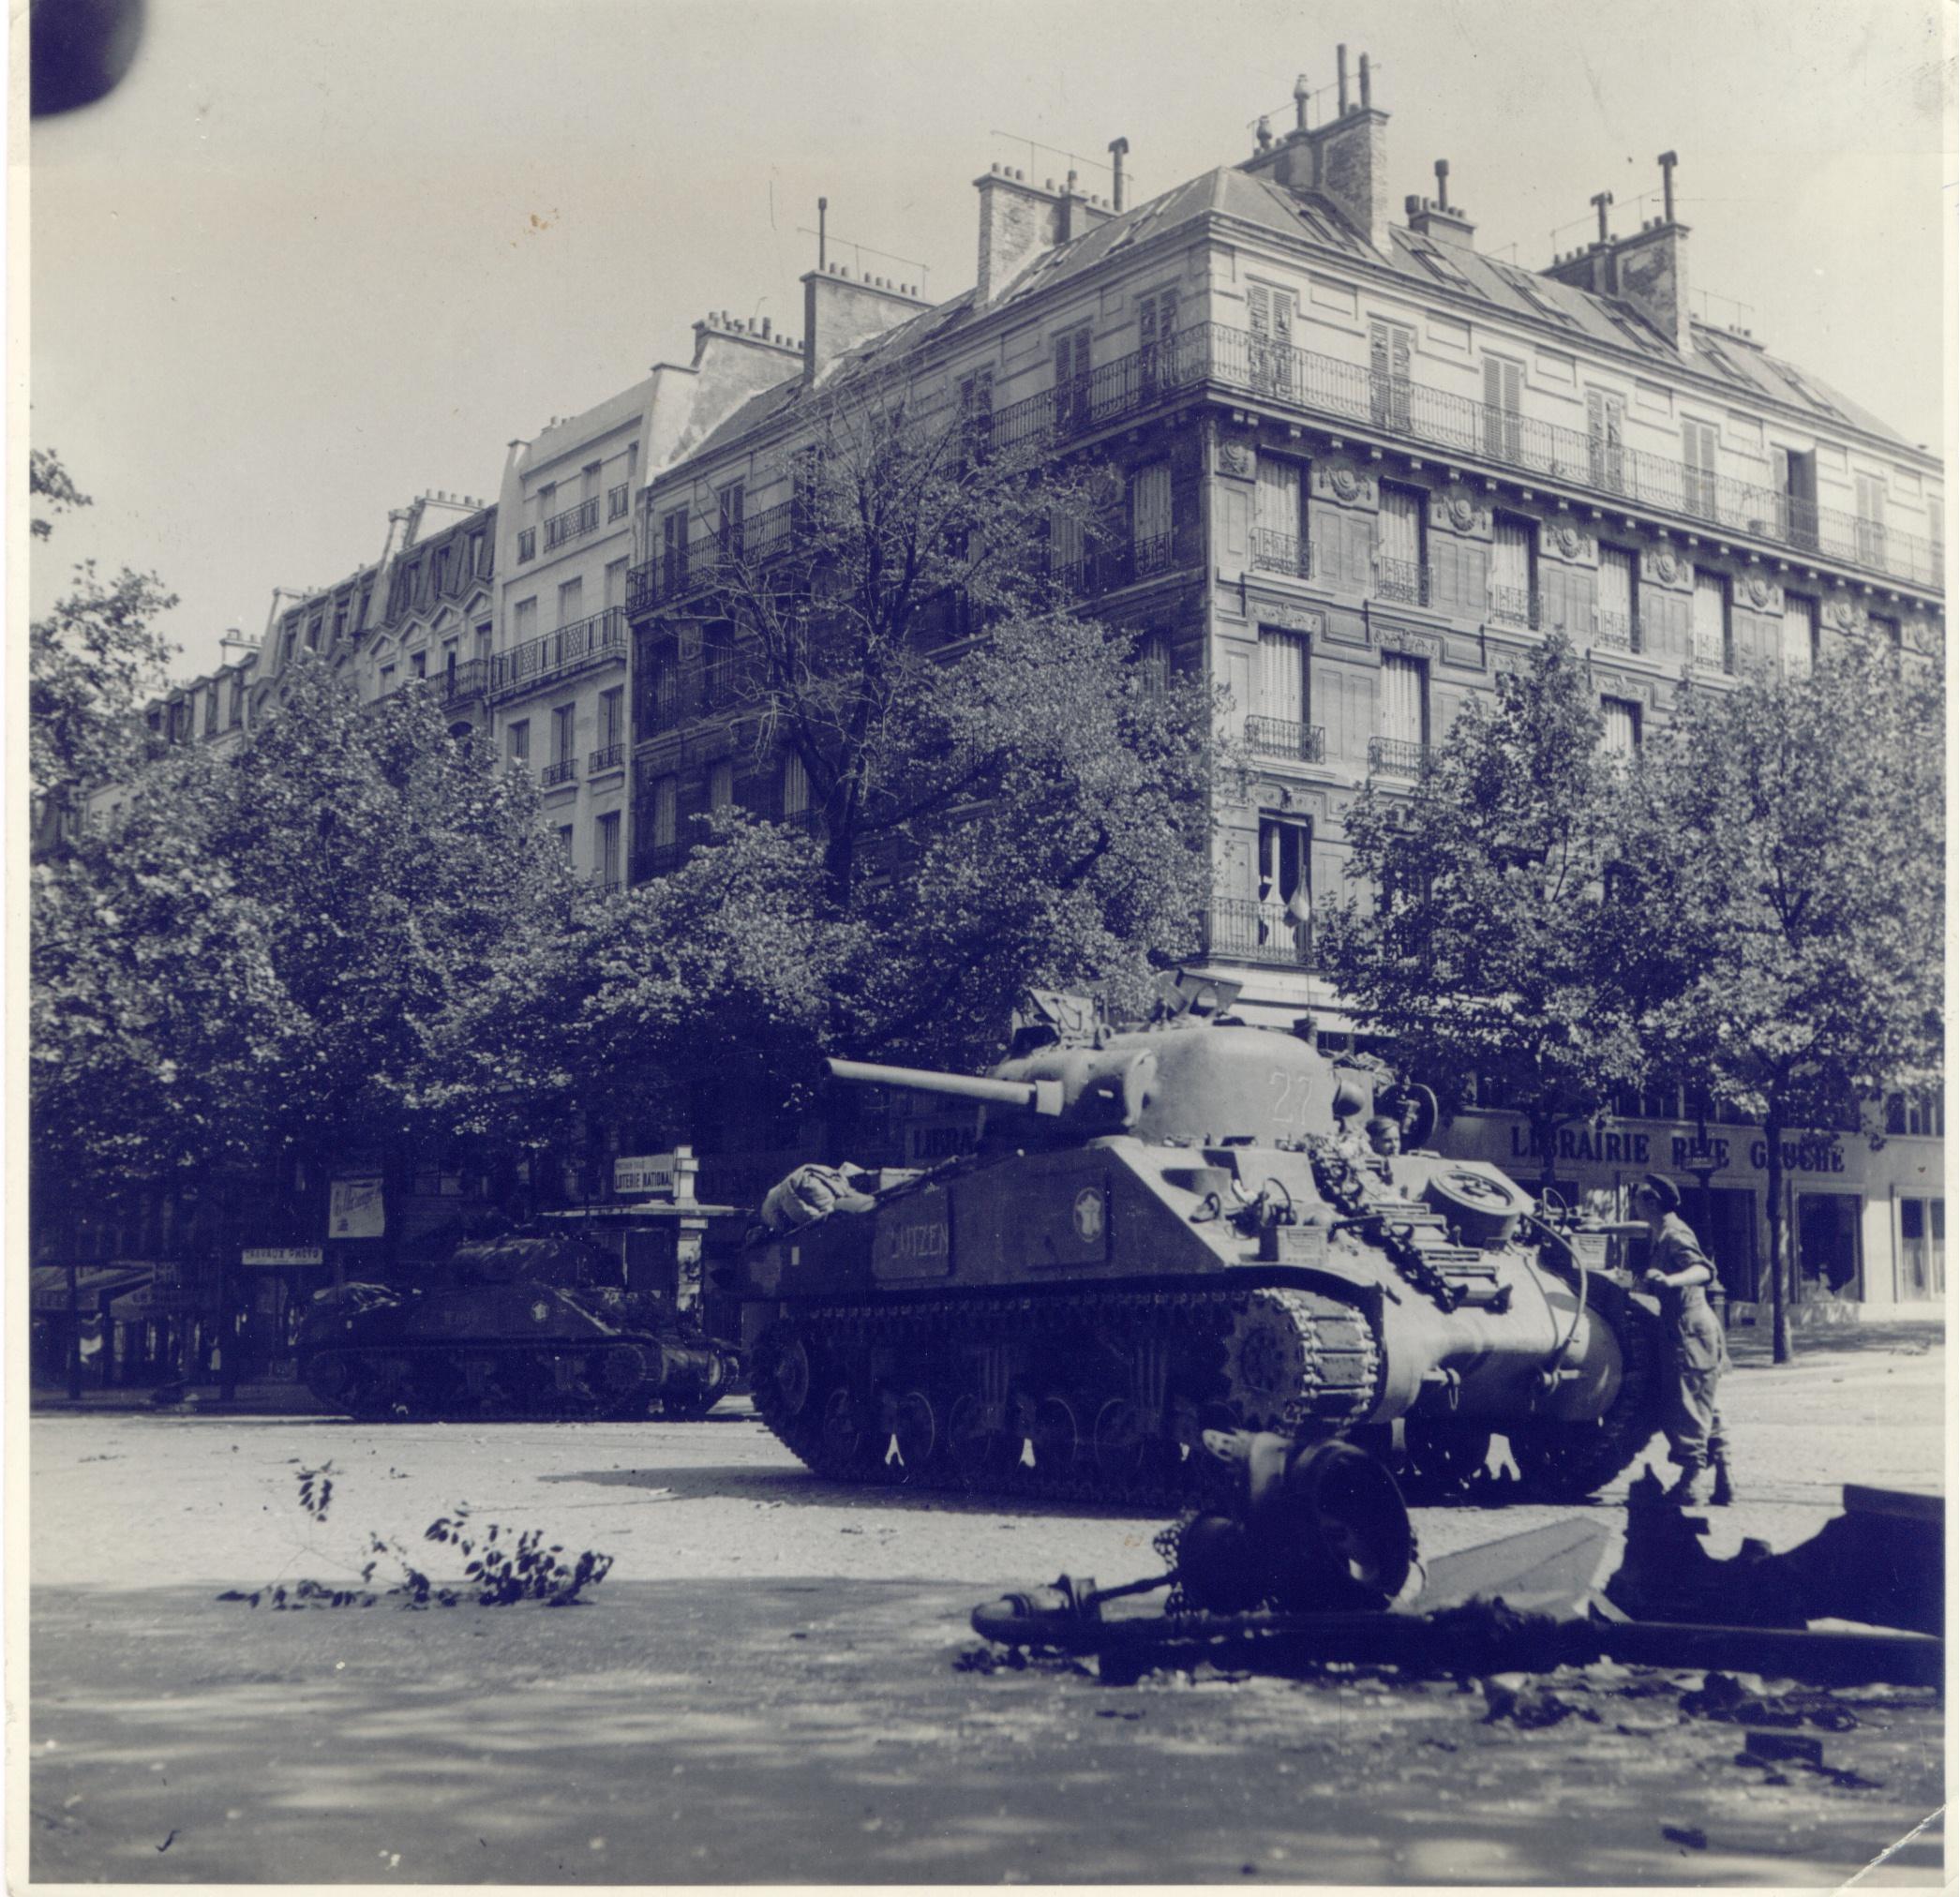 25 Août 1944, Lutzen en combat, Boulevard Saint Michel. Marcel Guénan.